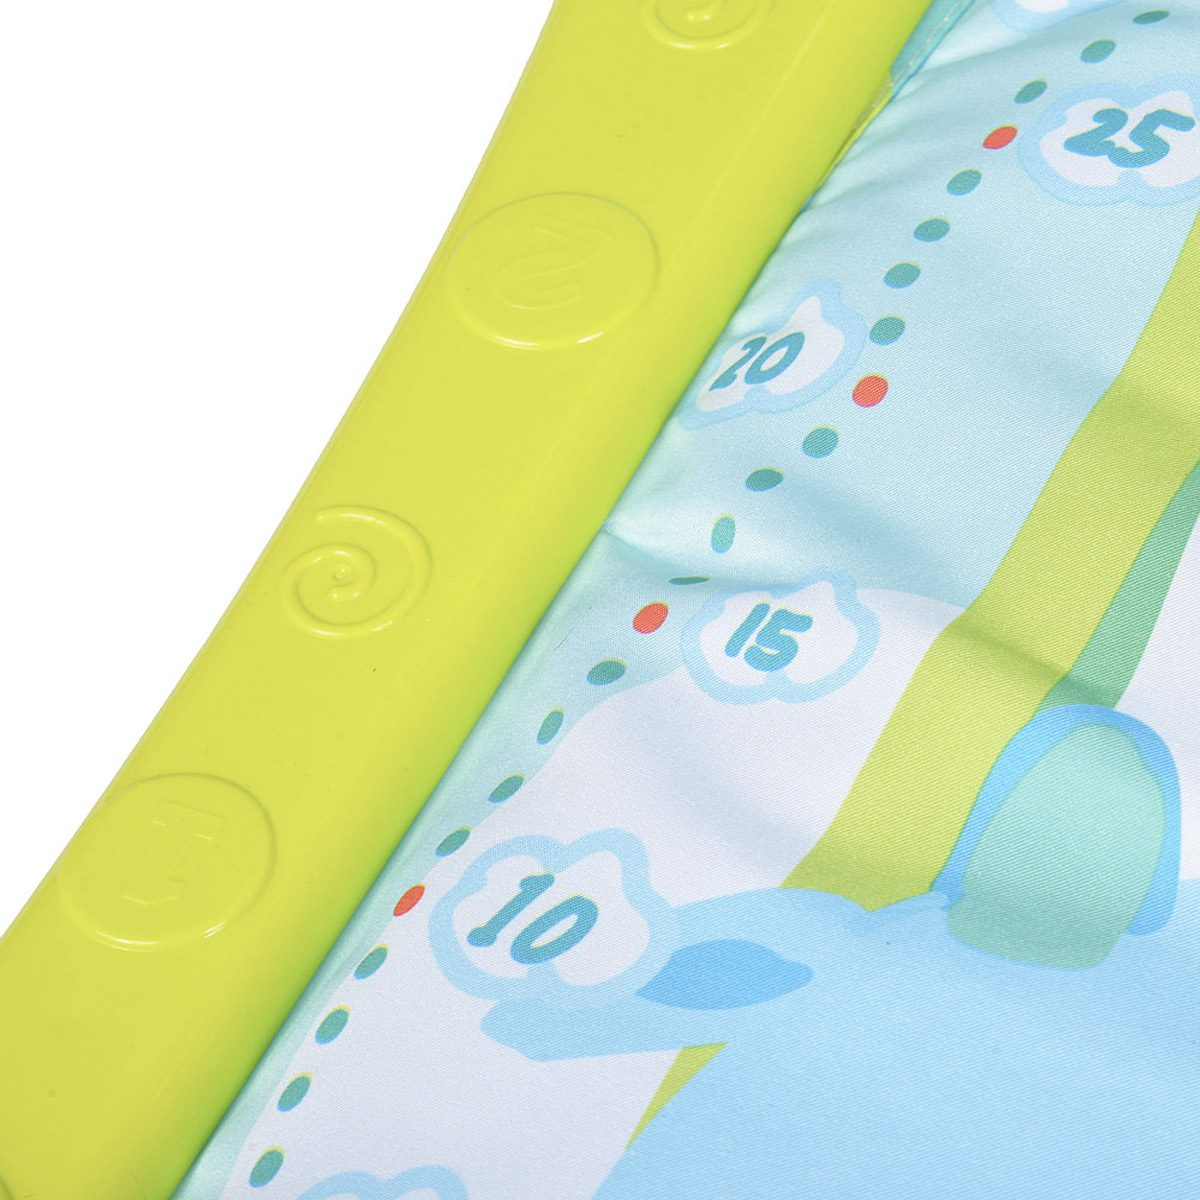 colourful design activity play mat